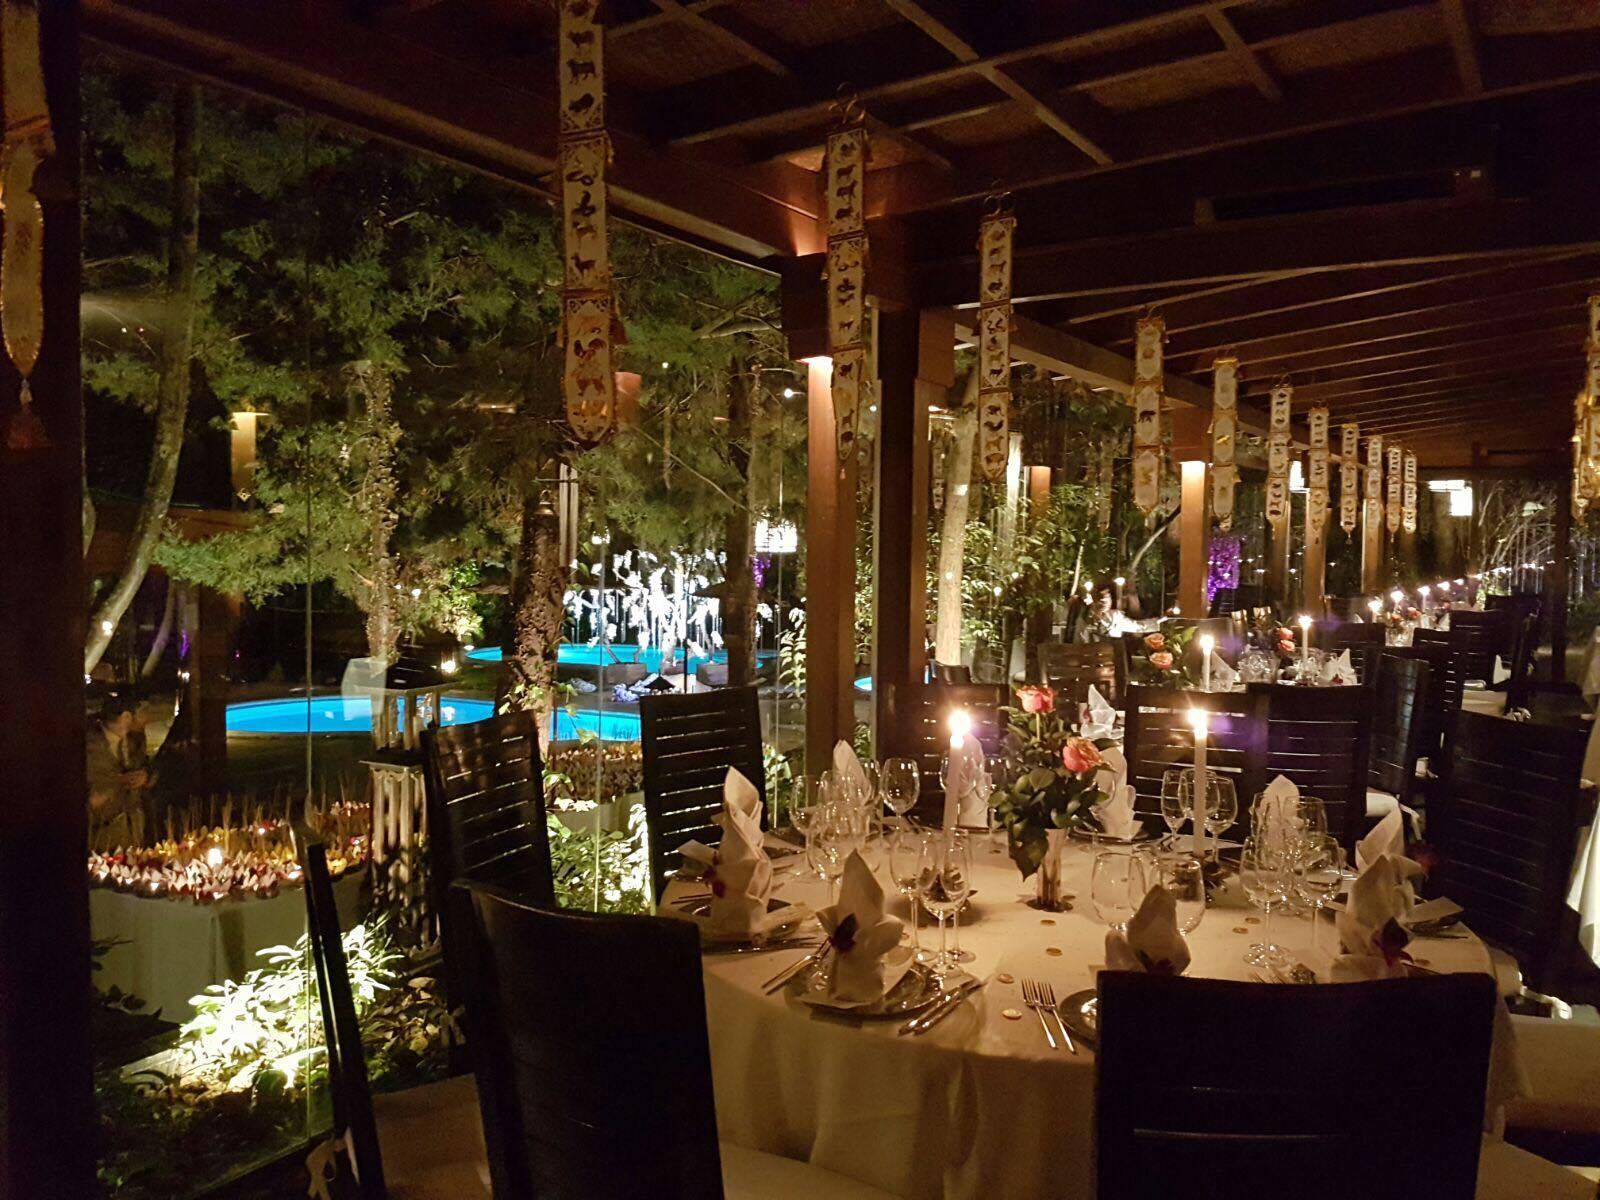 Restaurante Thai Garden, en la calle Arturo Soria, 207.